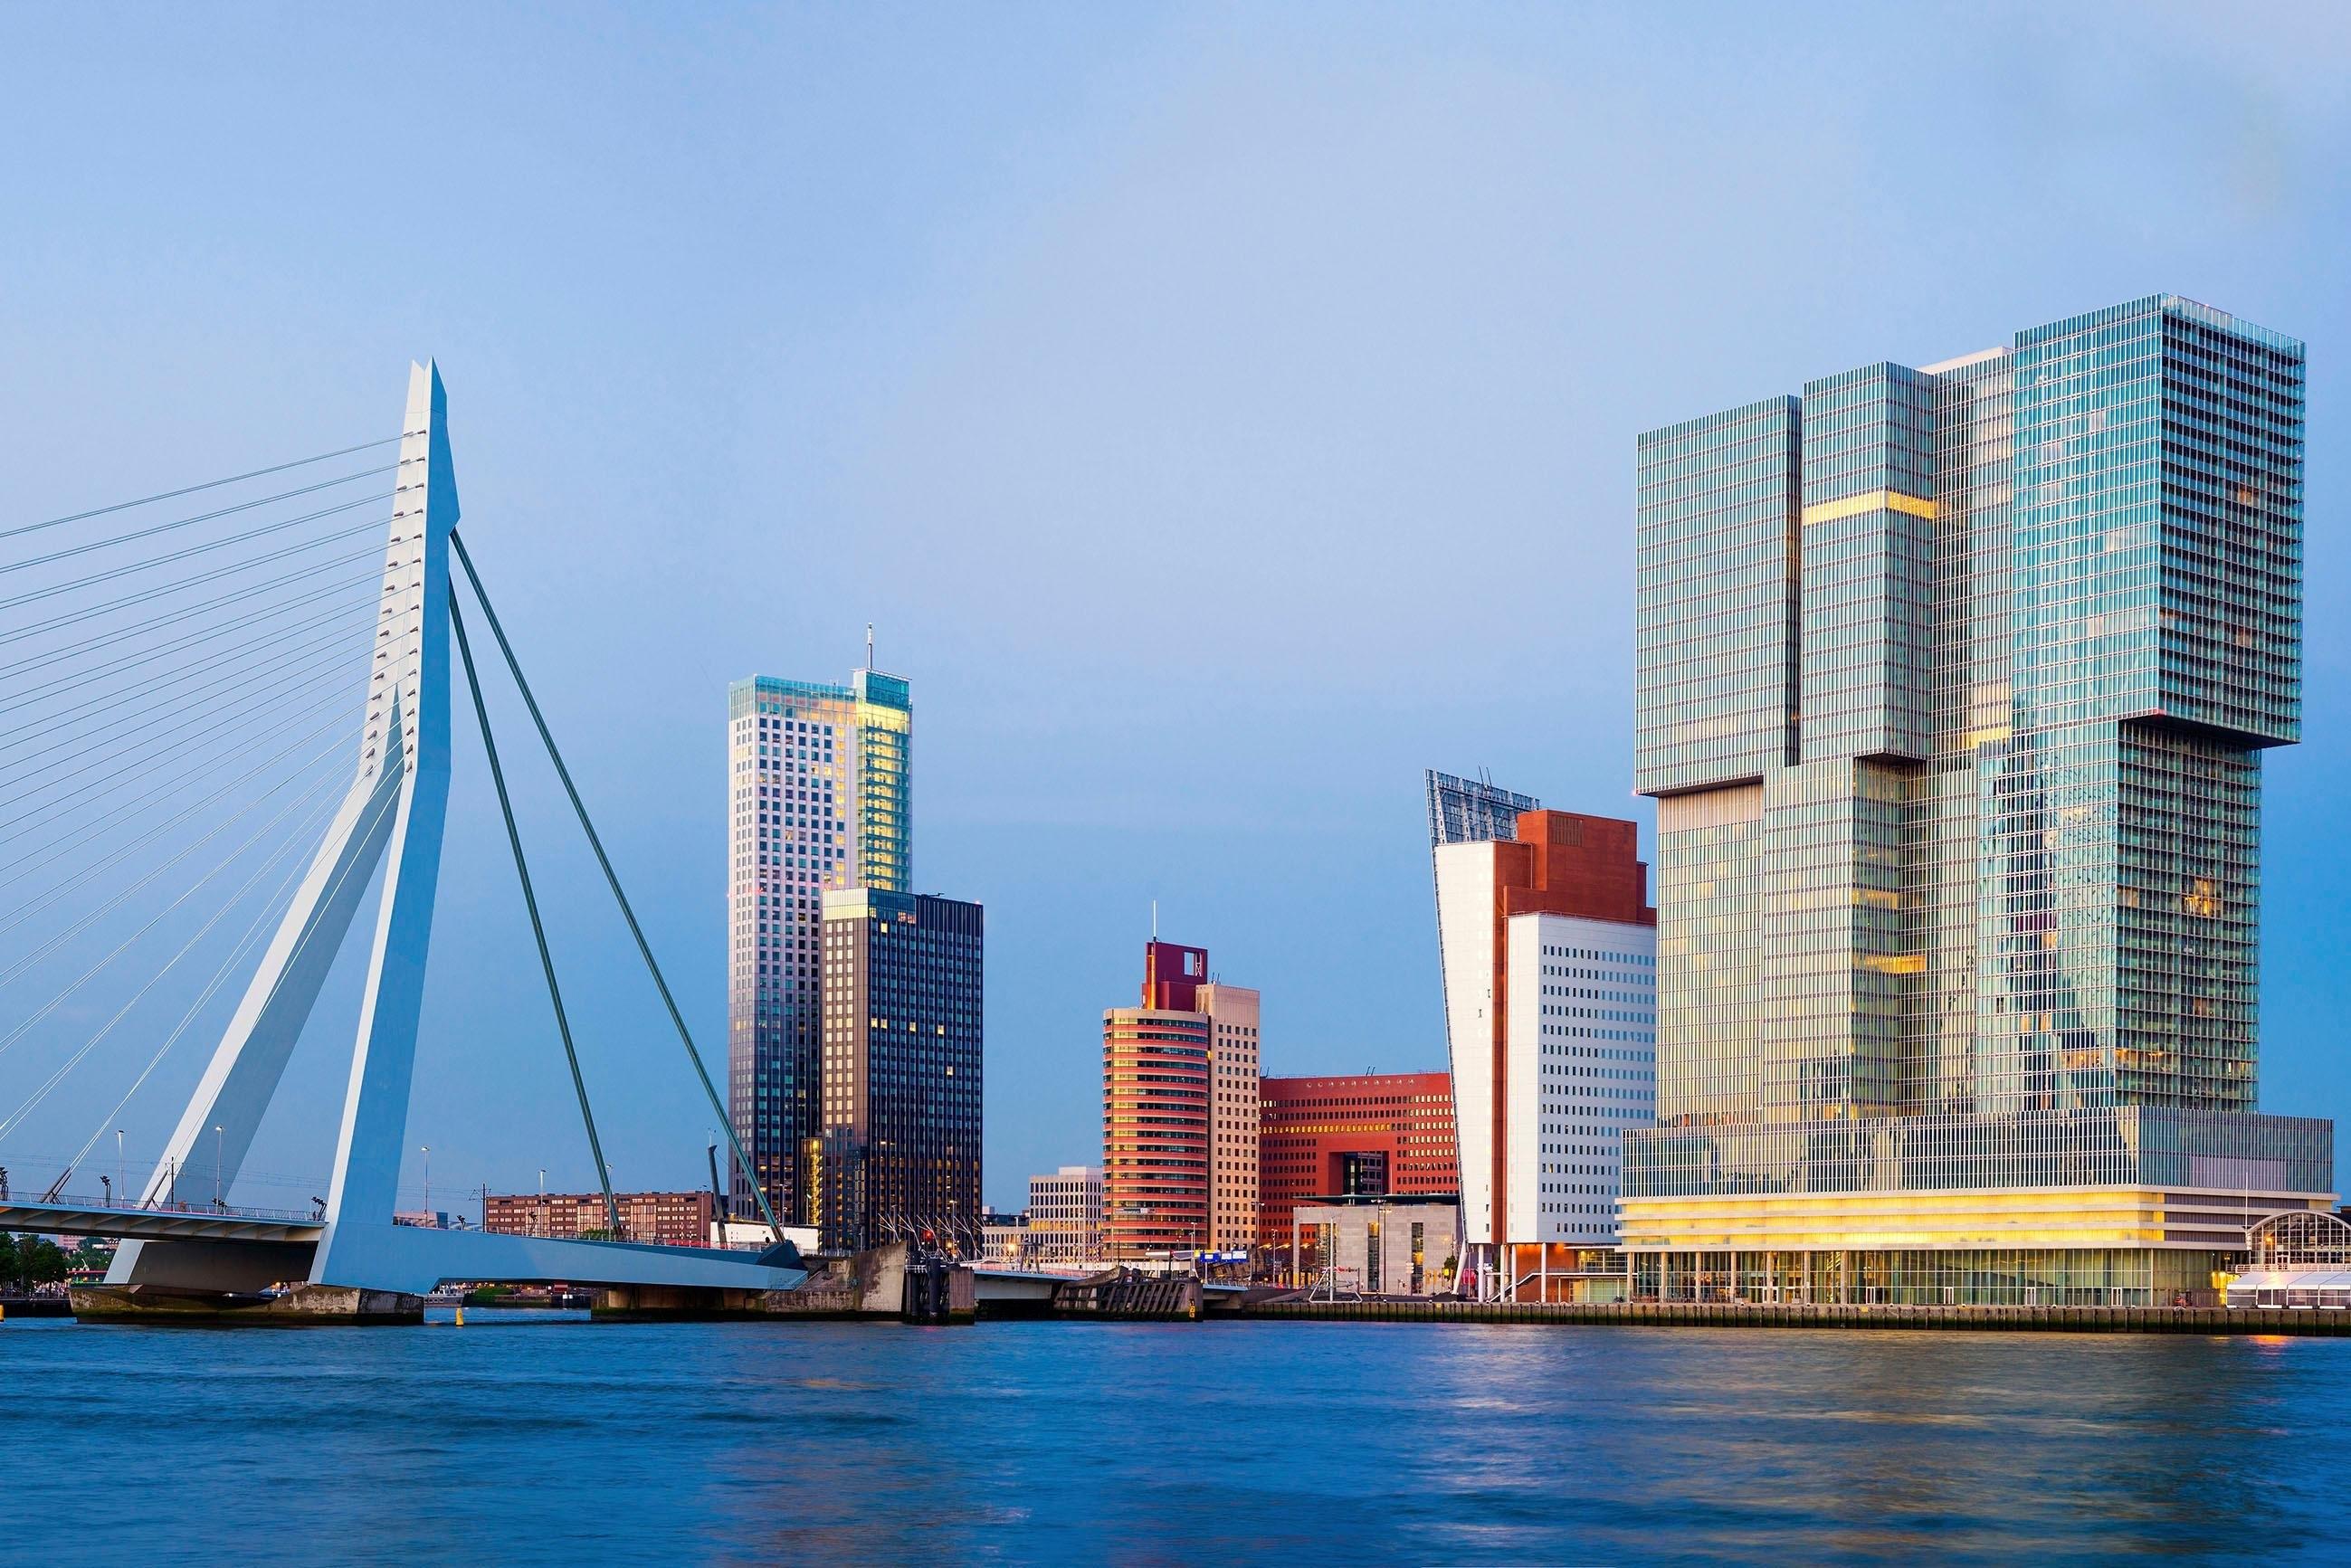 Places of Style Artprint op acrylglas Stad online kopen op otto.nl